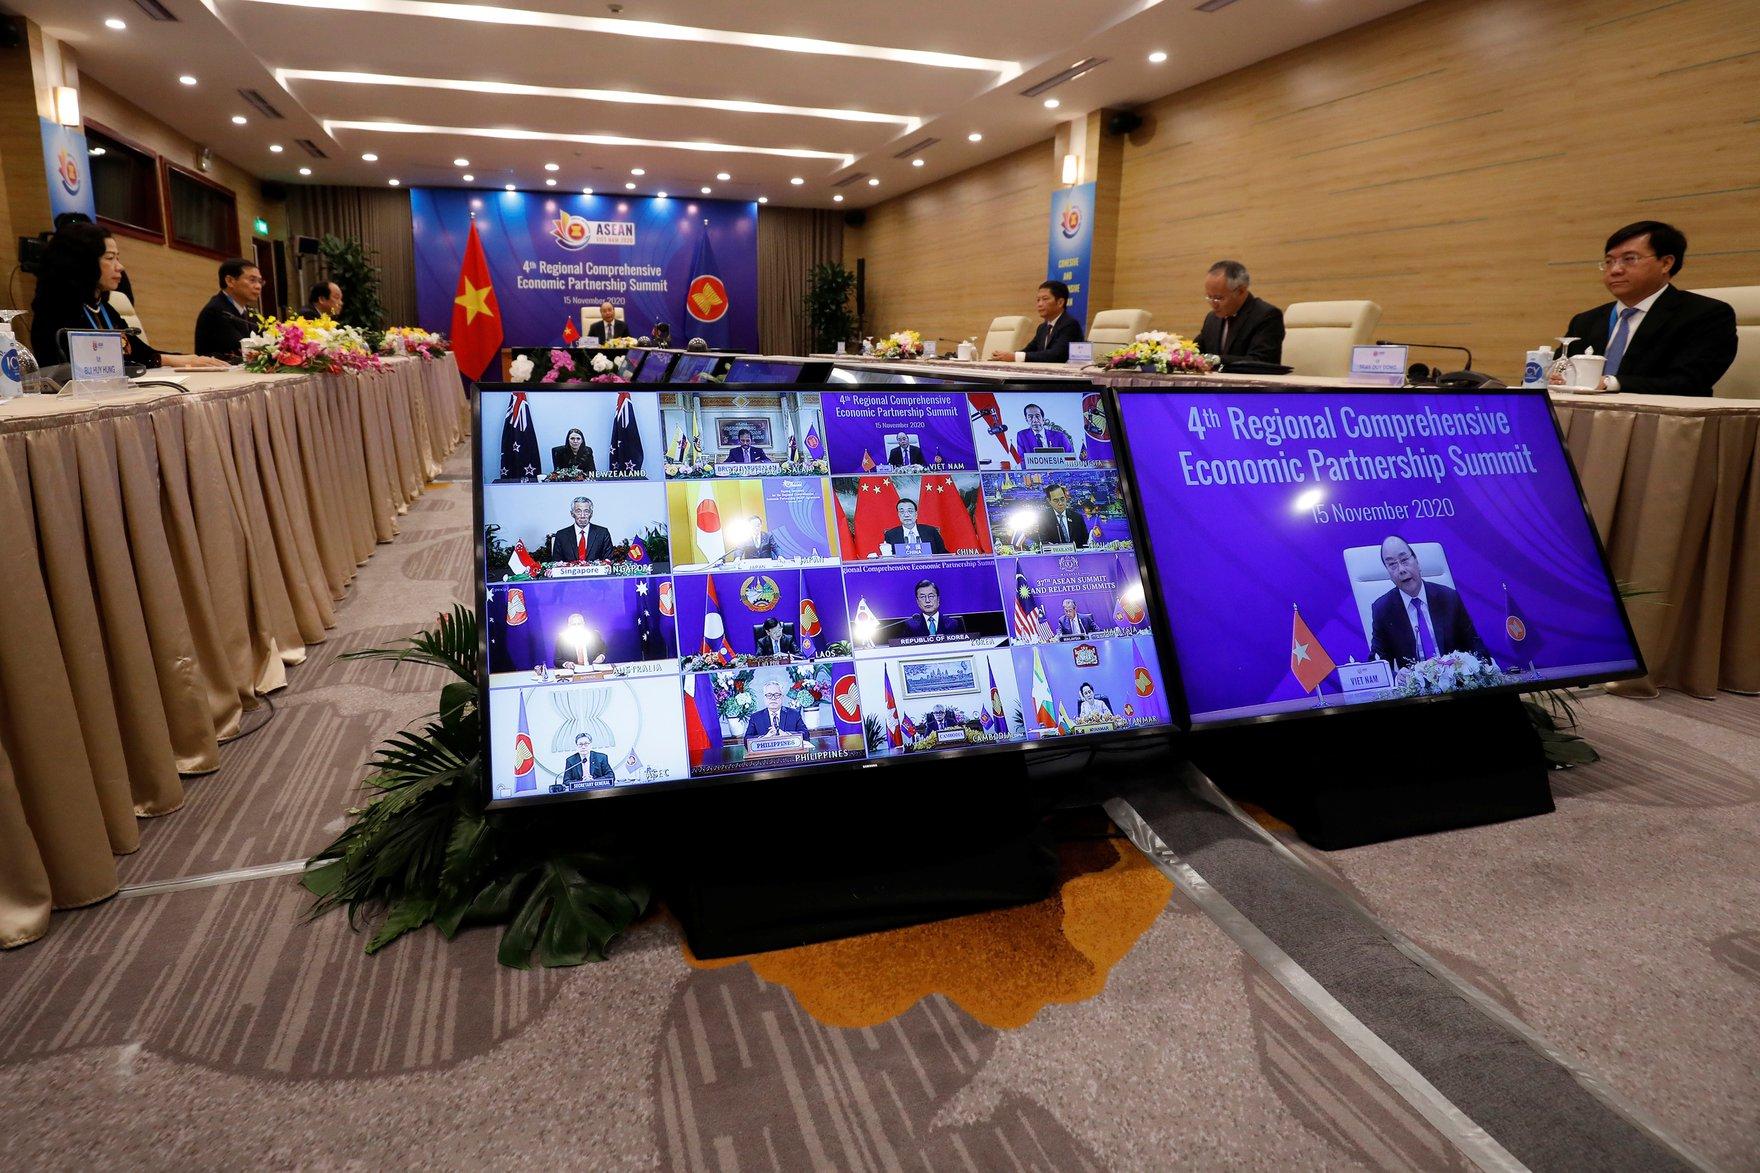 2020-11-15T041007Z_788125379_RC2G3K9CPX8H_RTRMADP_3_ASEAN-SUMMIT-RCEP.JPG